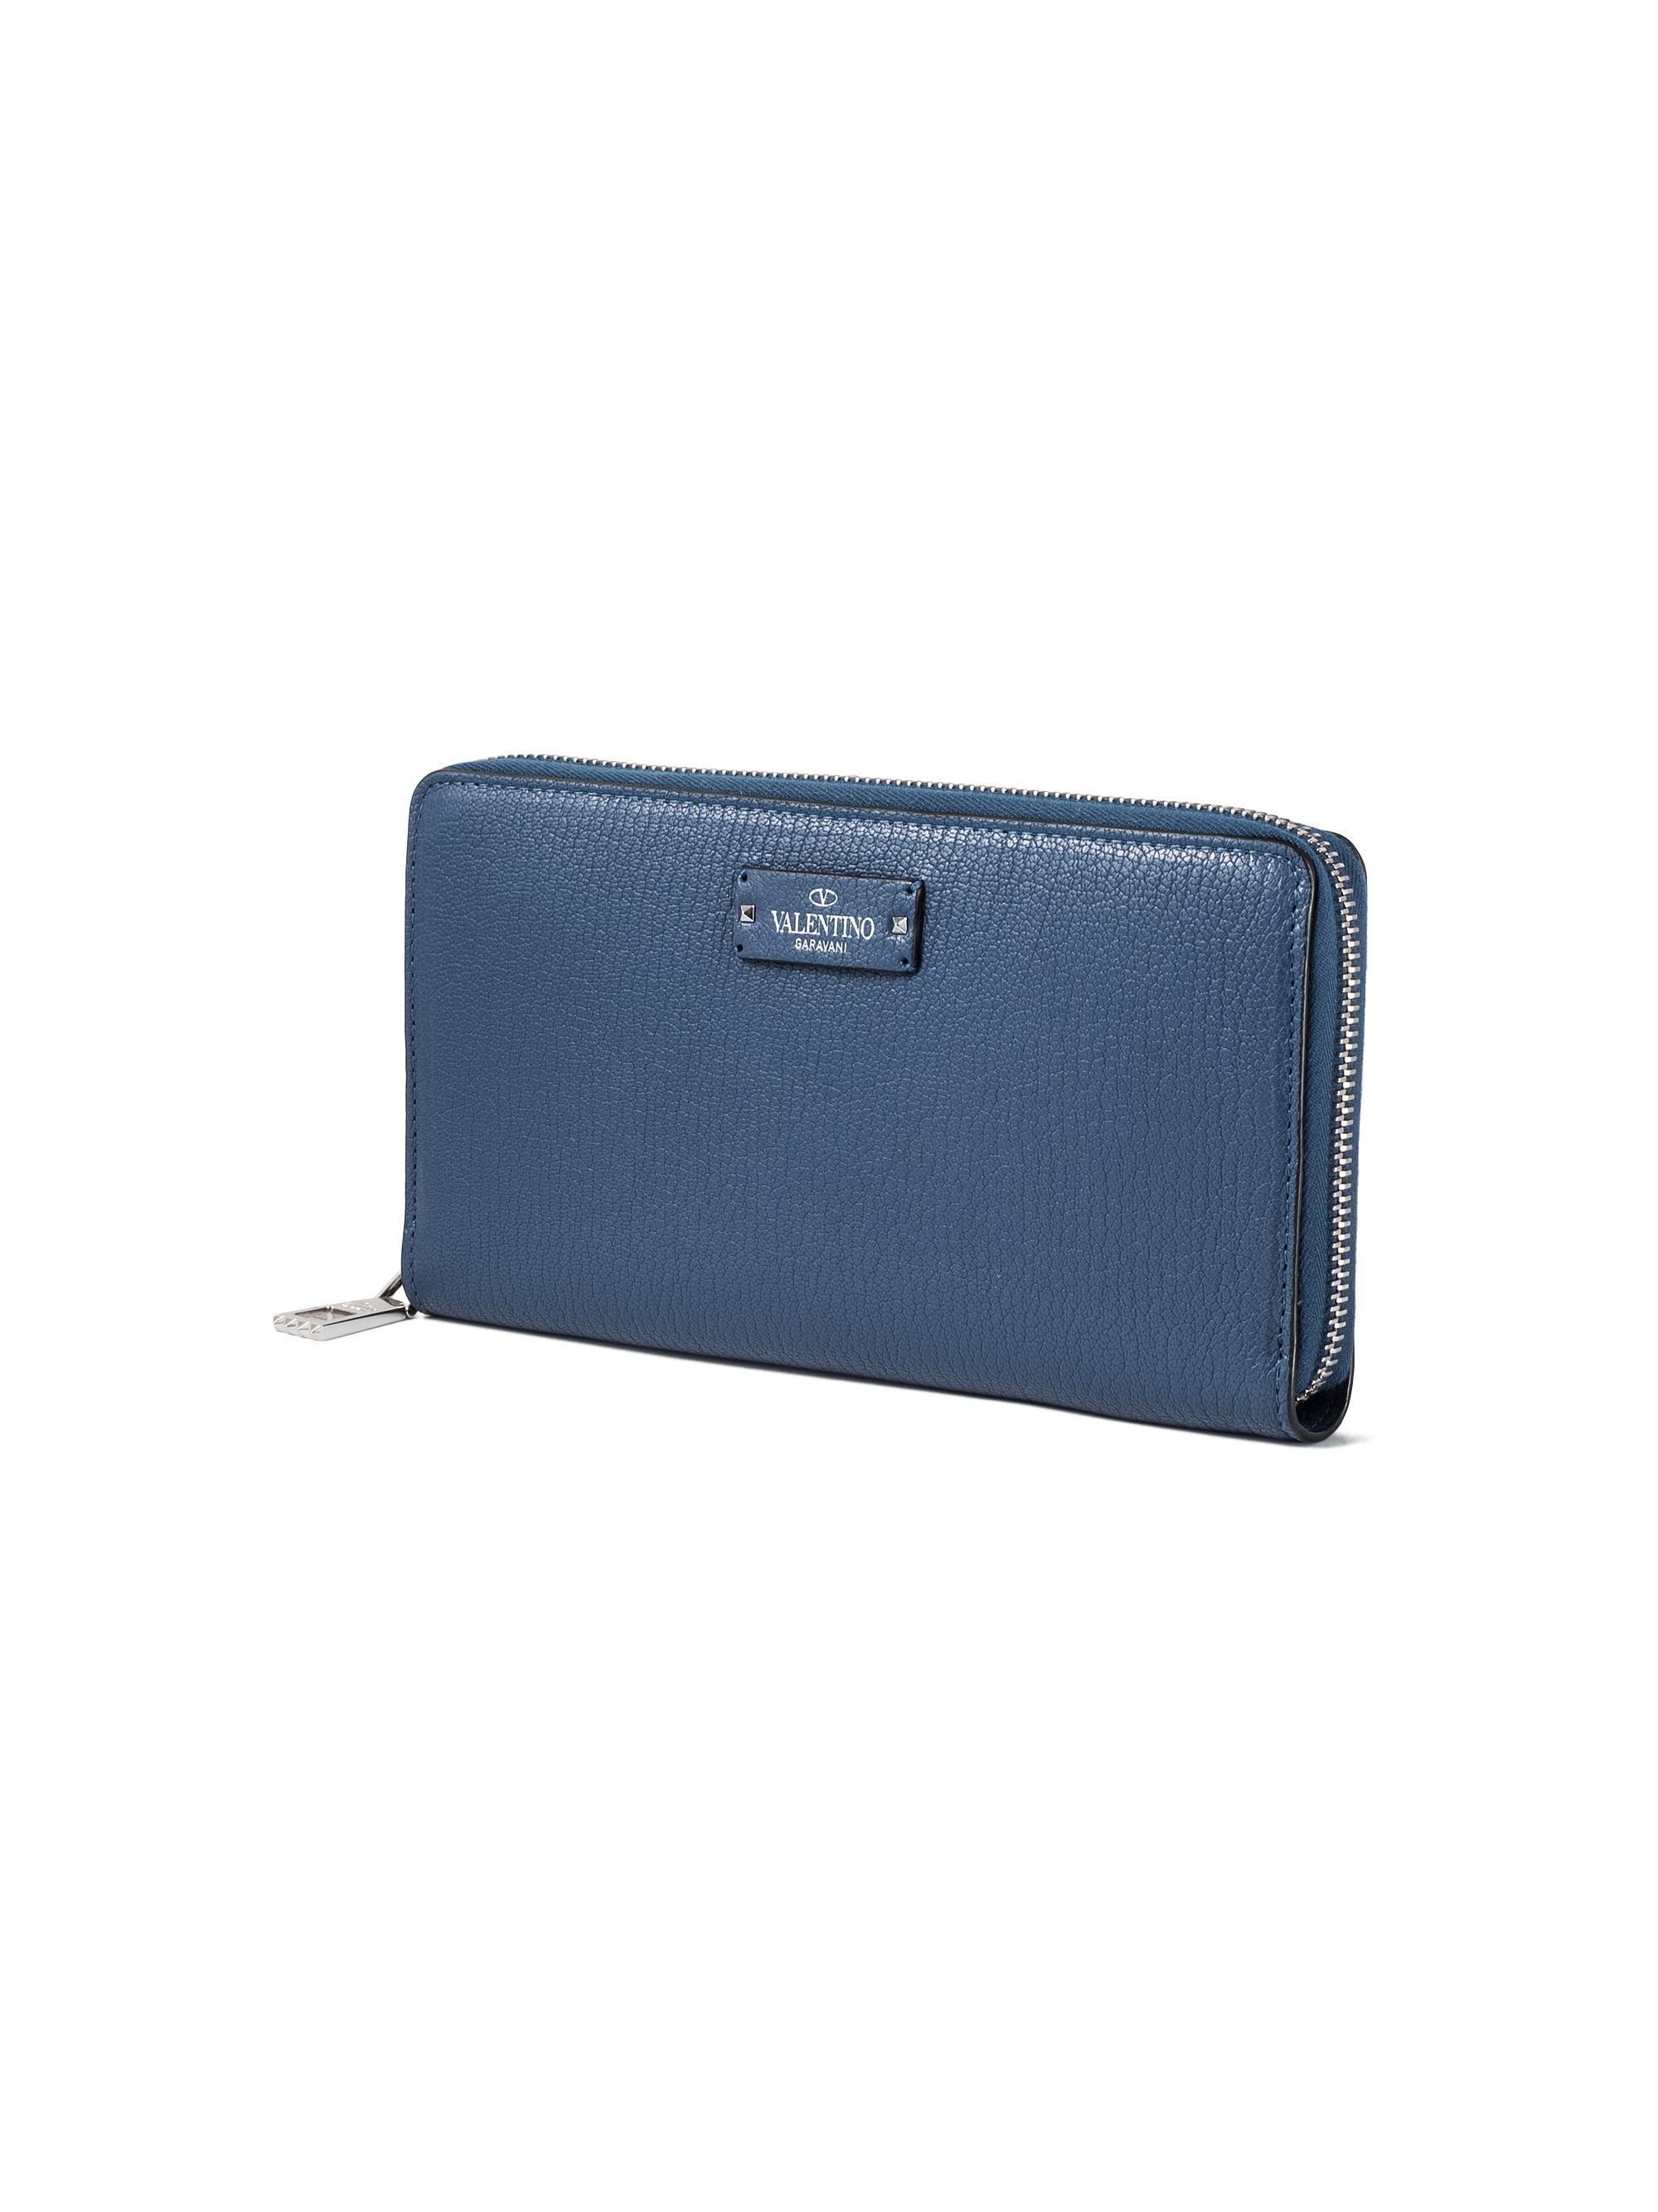 539d3c1071e0f Lyst - Valentino Garavani Cardholder With Zip in Blue for Men